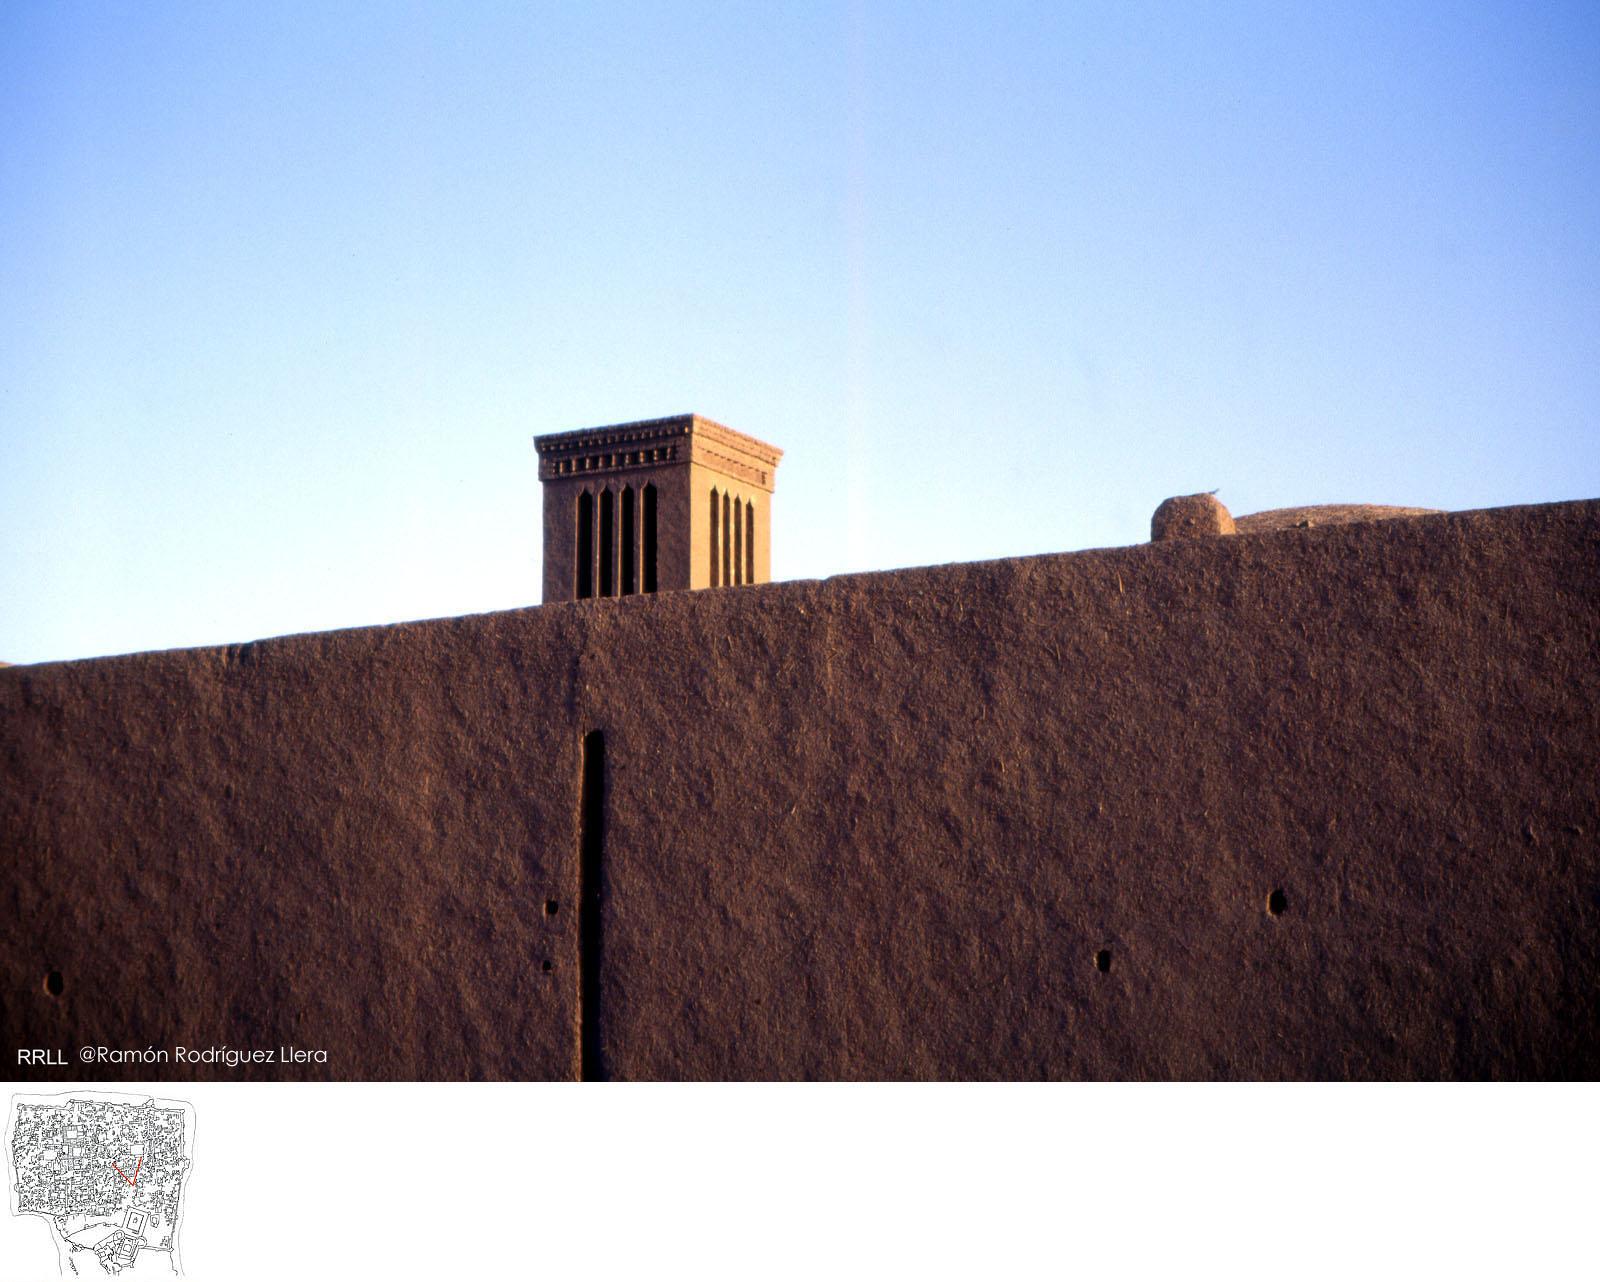 danielvillalobos-architecturalexhibition-bam-architectureofmud-34